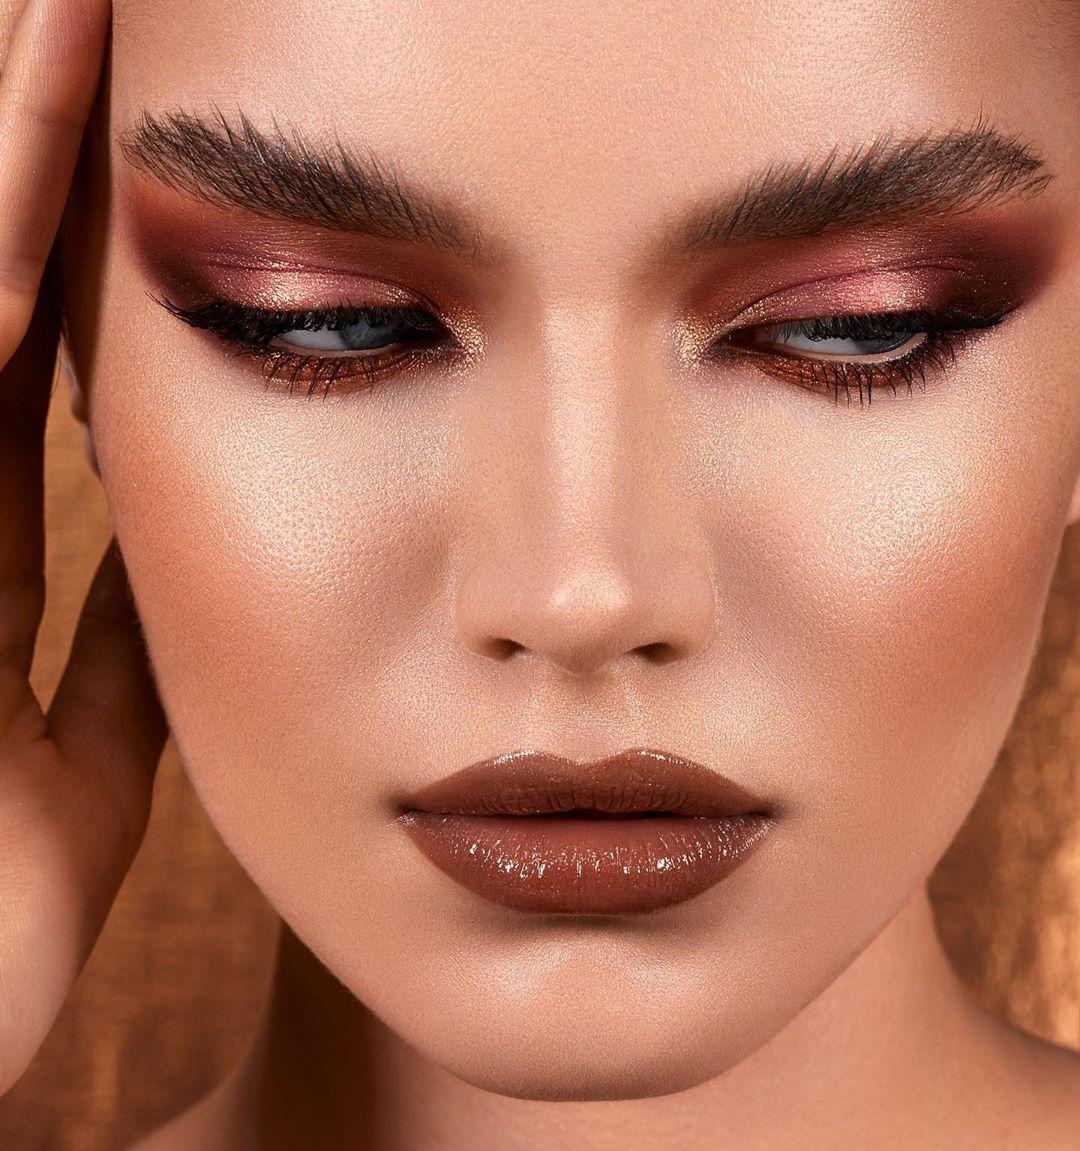 Fast-Solist: MUG Moondust Makeup MAGIMANIA Beauty Blog